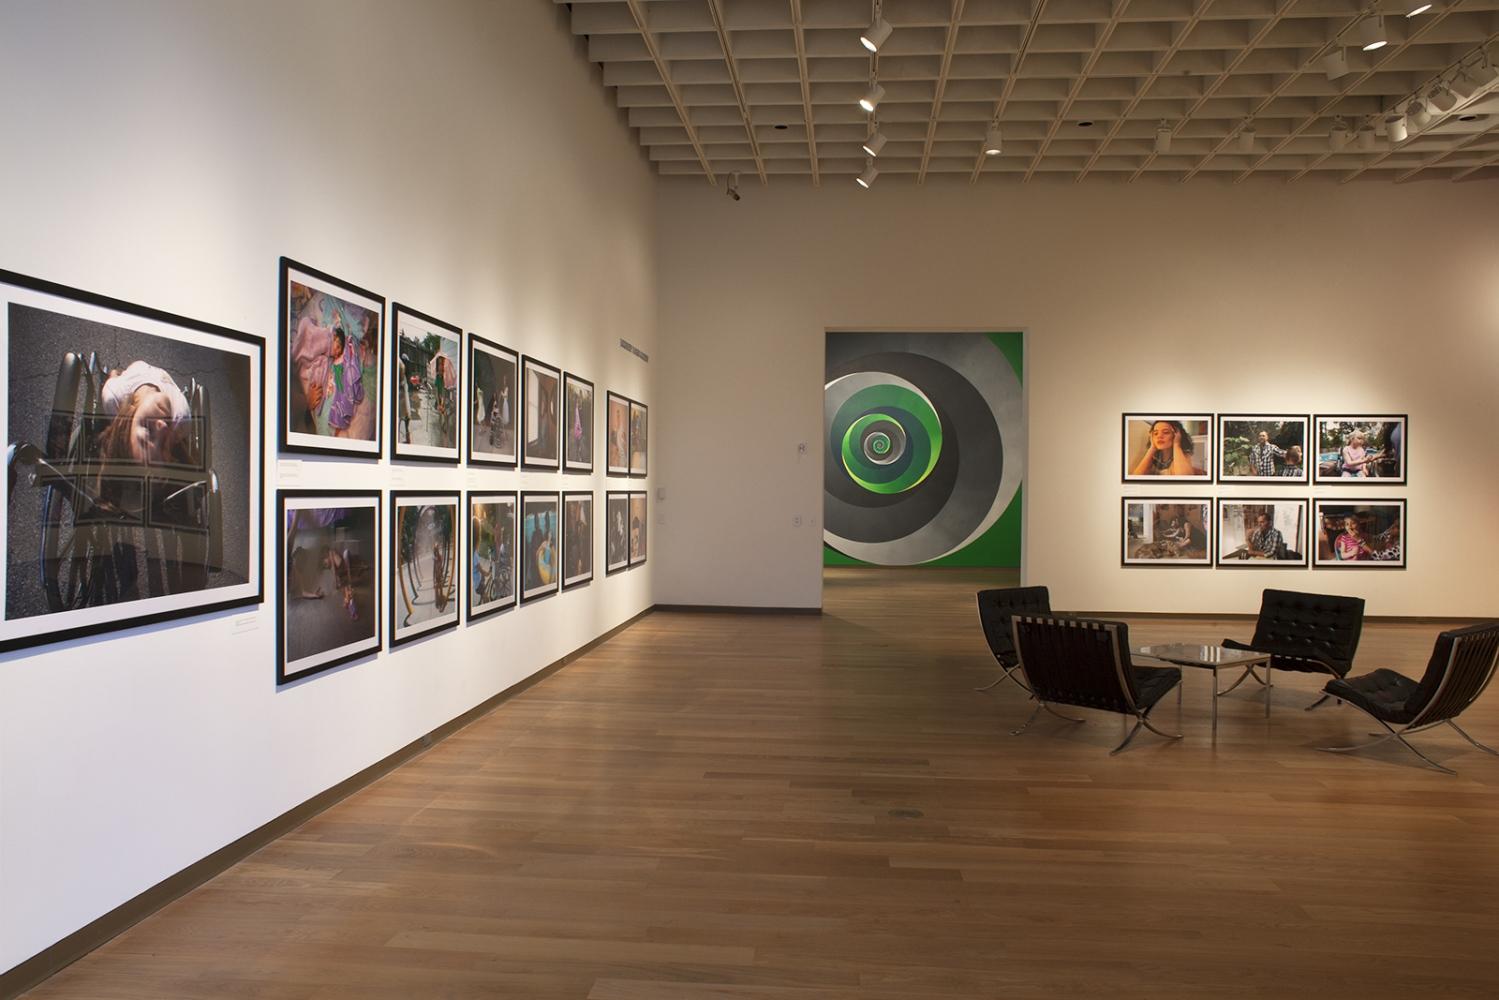 Art and Documentary Photography - Loading IMG_9155_OMA_exhibition_still_visura_jennifer_kaczmarek.jpg